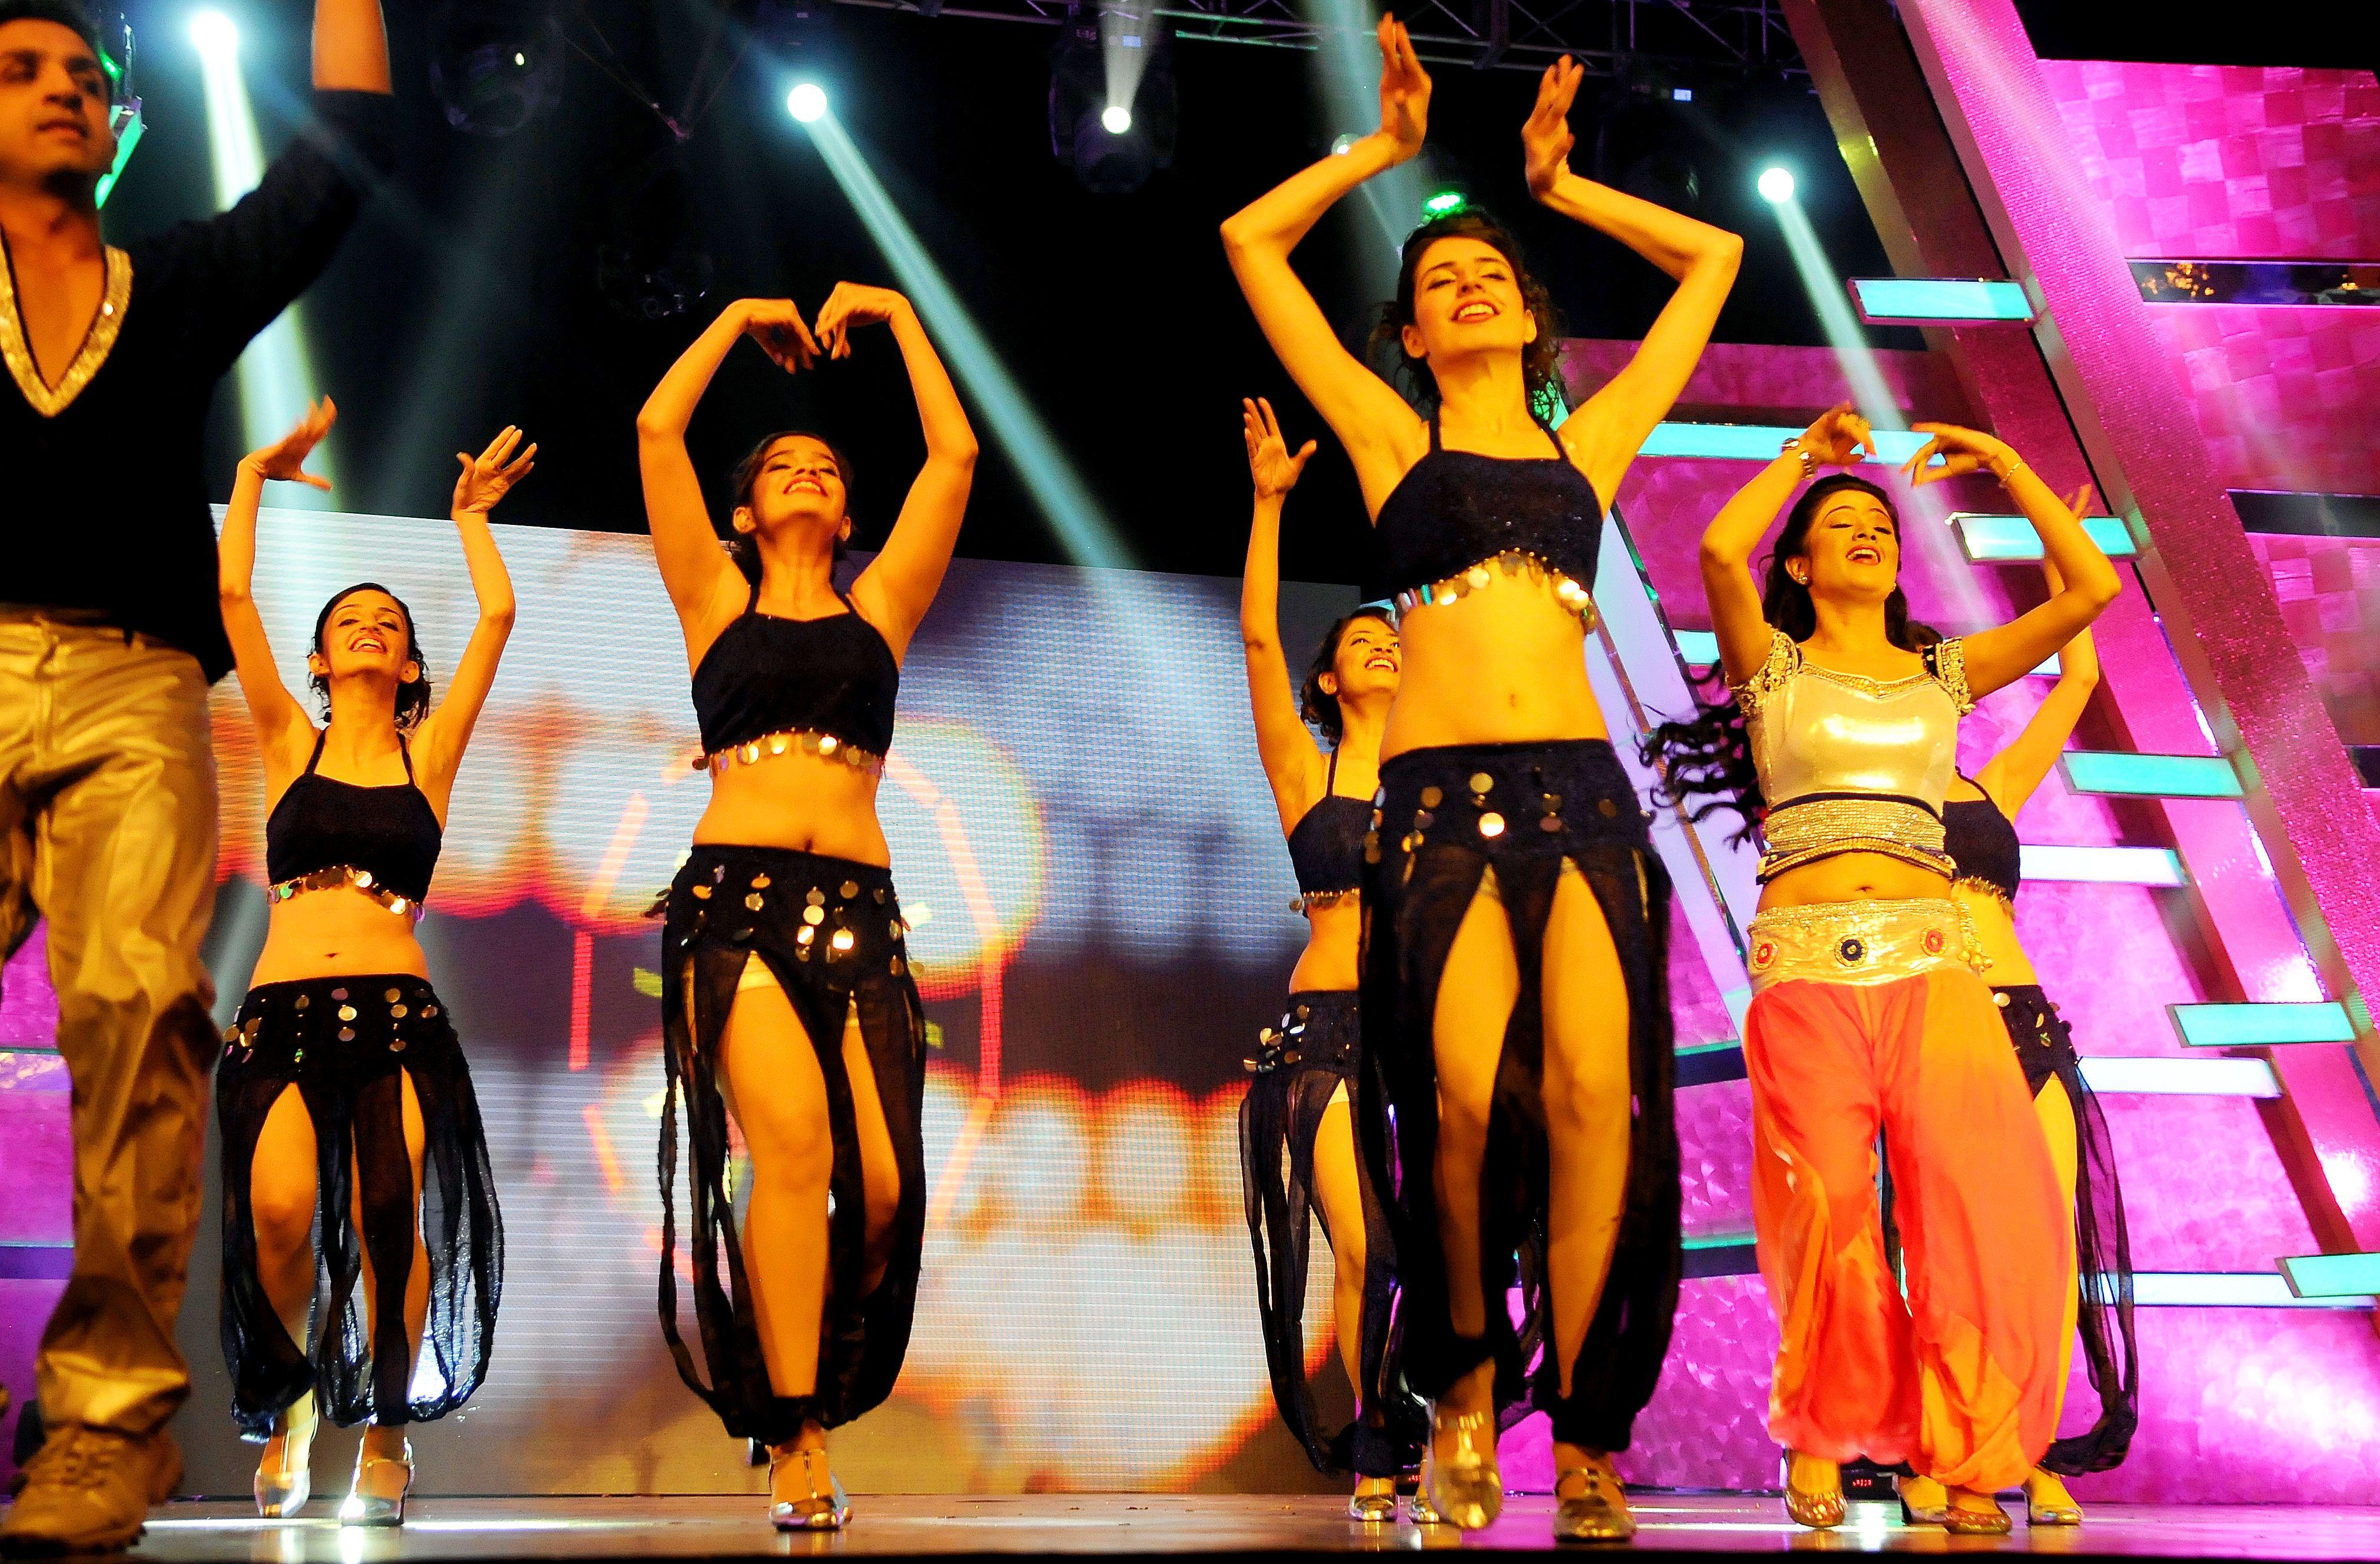 Oriya dancer Archita performs during 1st Vivel Filmfare Awards 2013 (East) at Science City auditorium in Kolkata